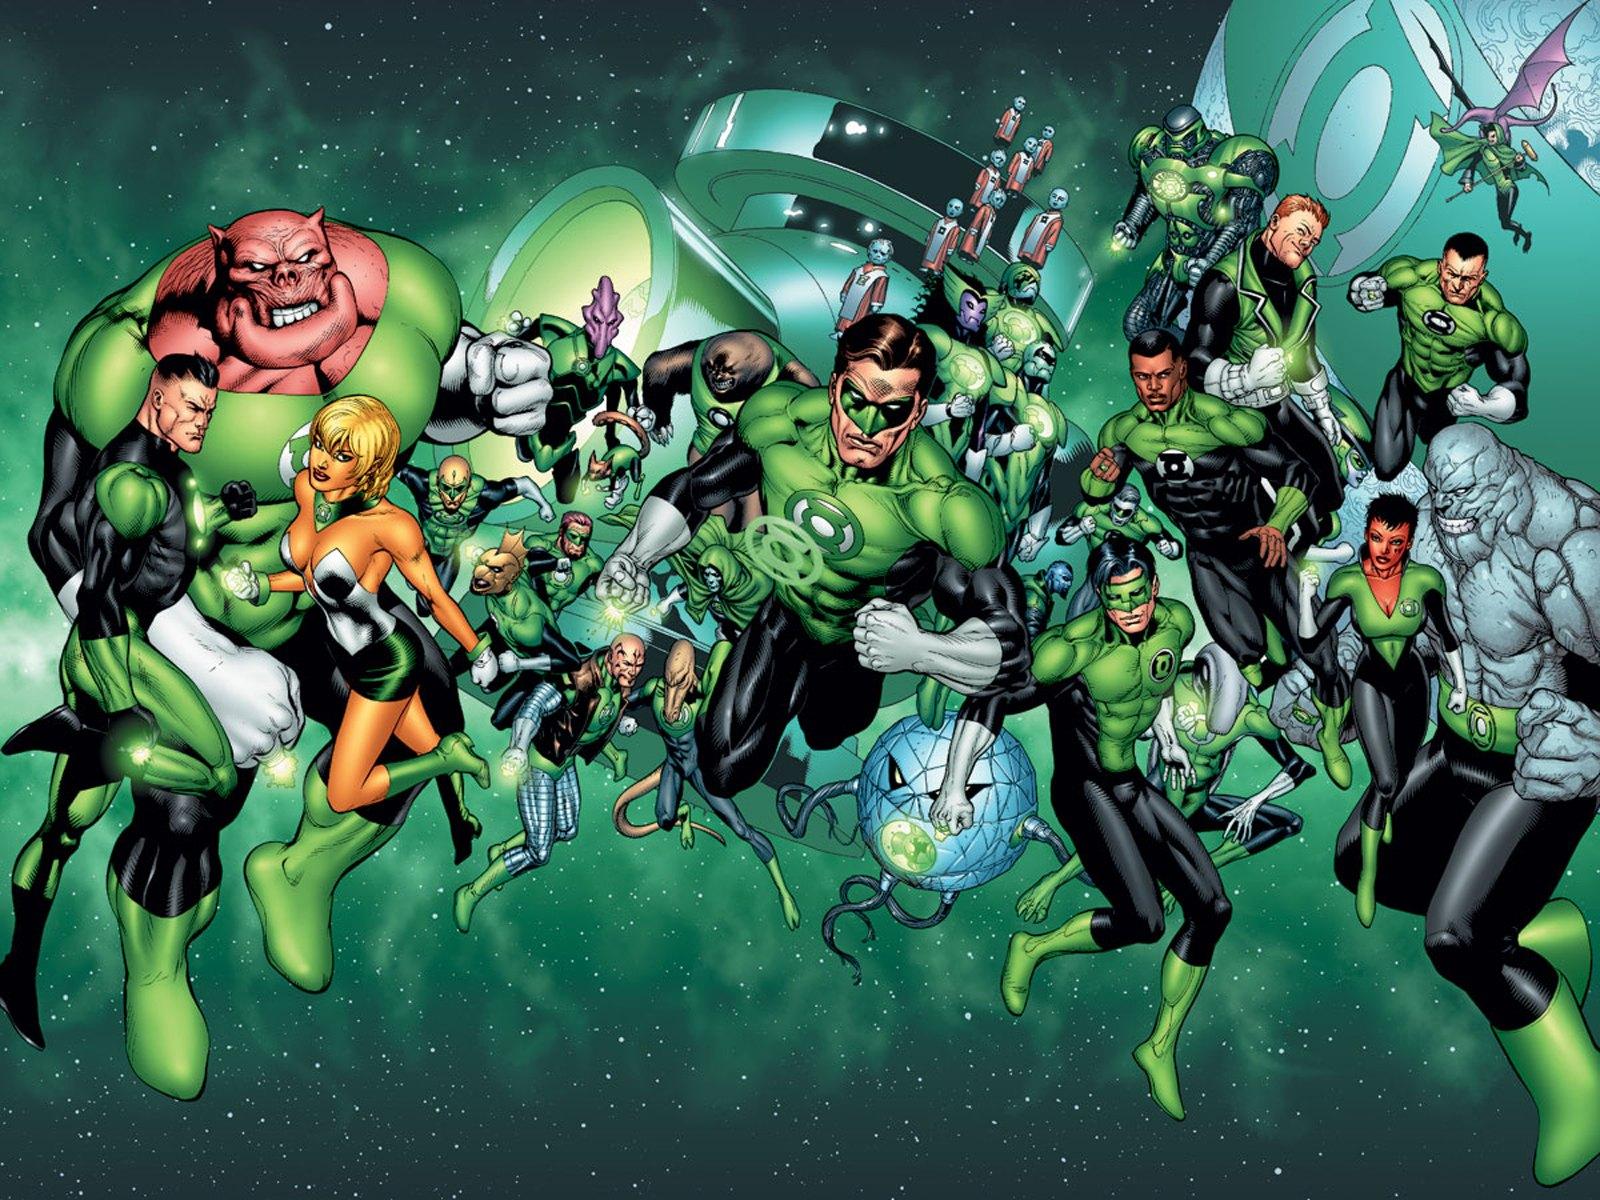 Green Lantern Corps - DC Comics